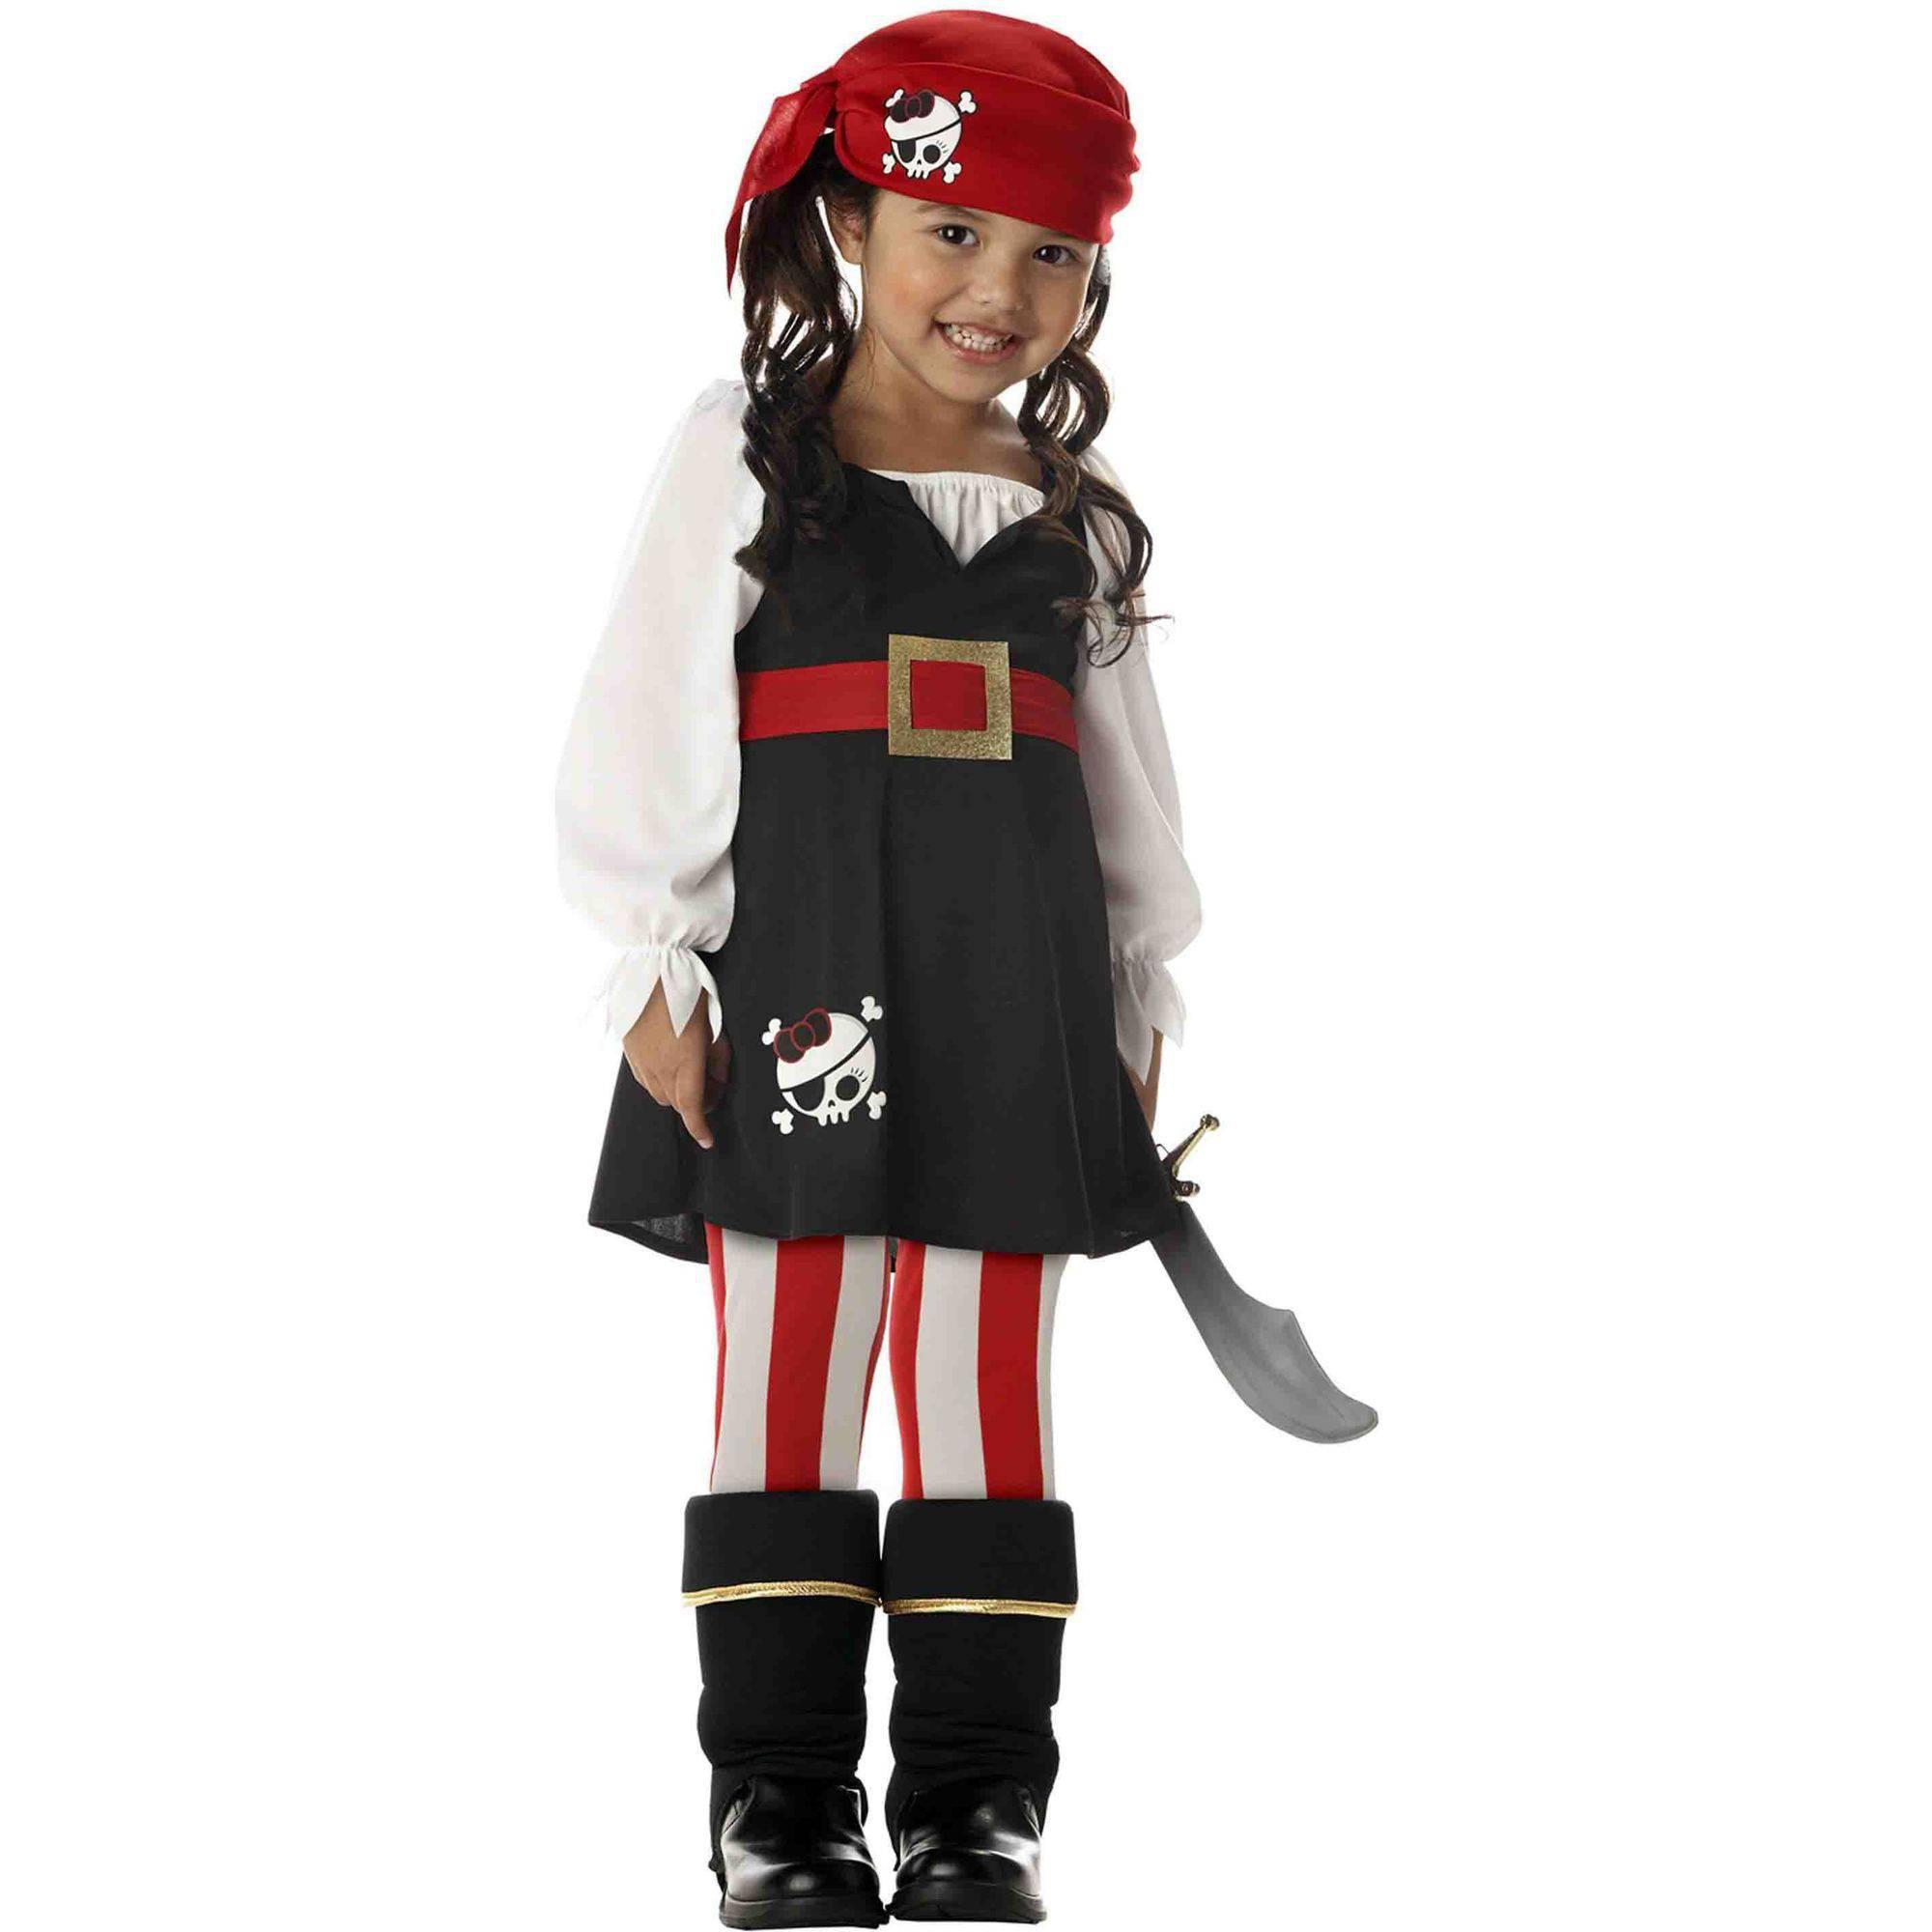 Precious Lil' Pirate Toddler Halloween Costume